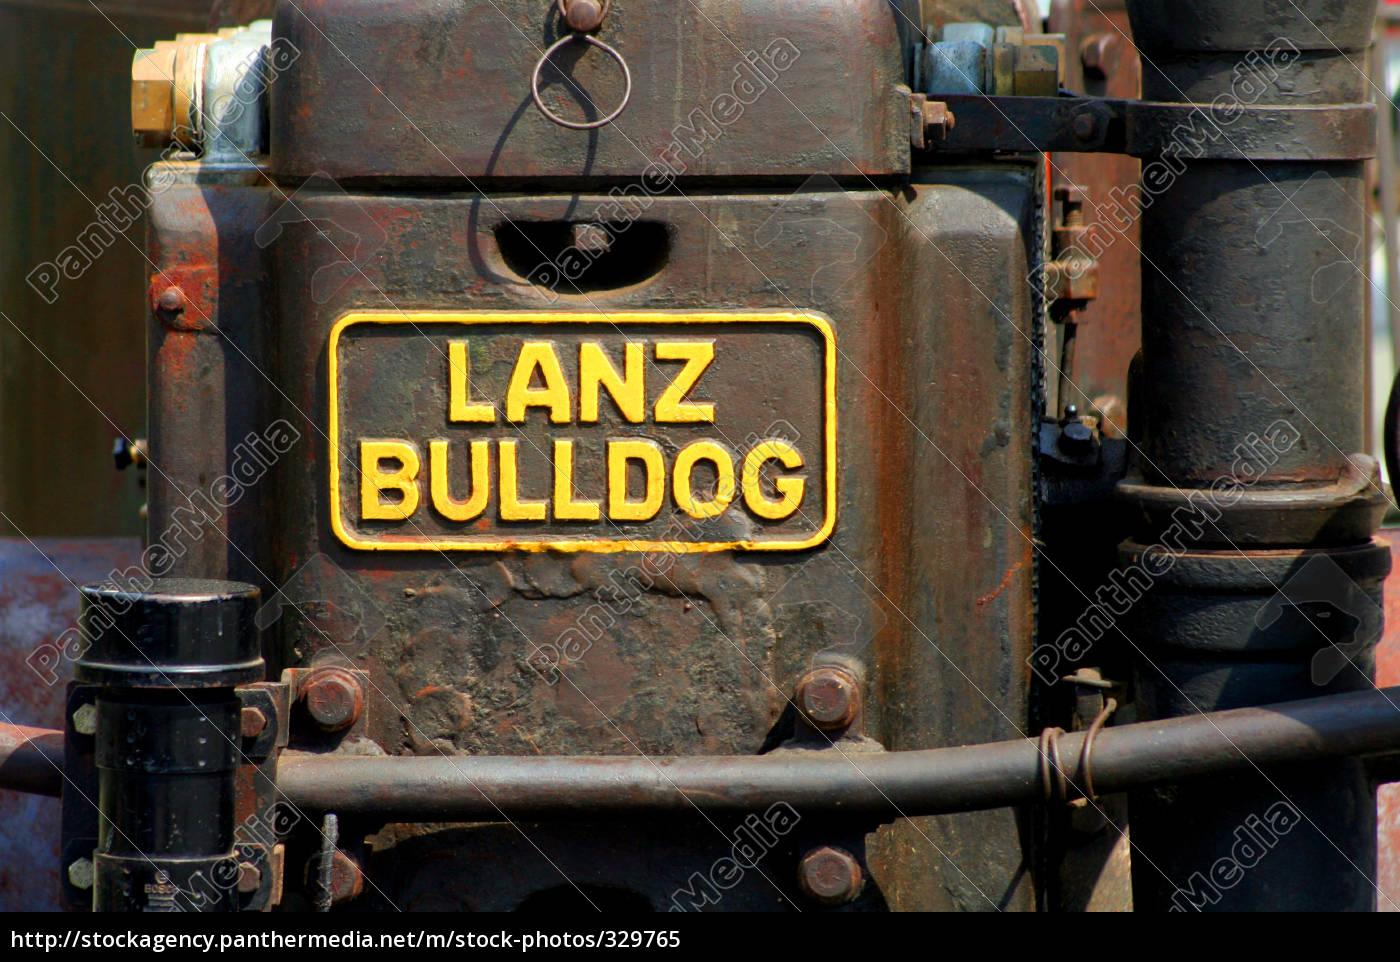 bulldog - 329765